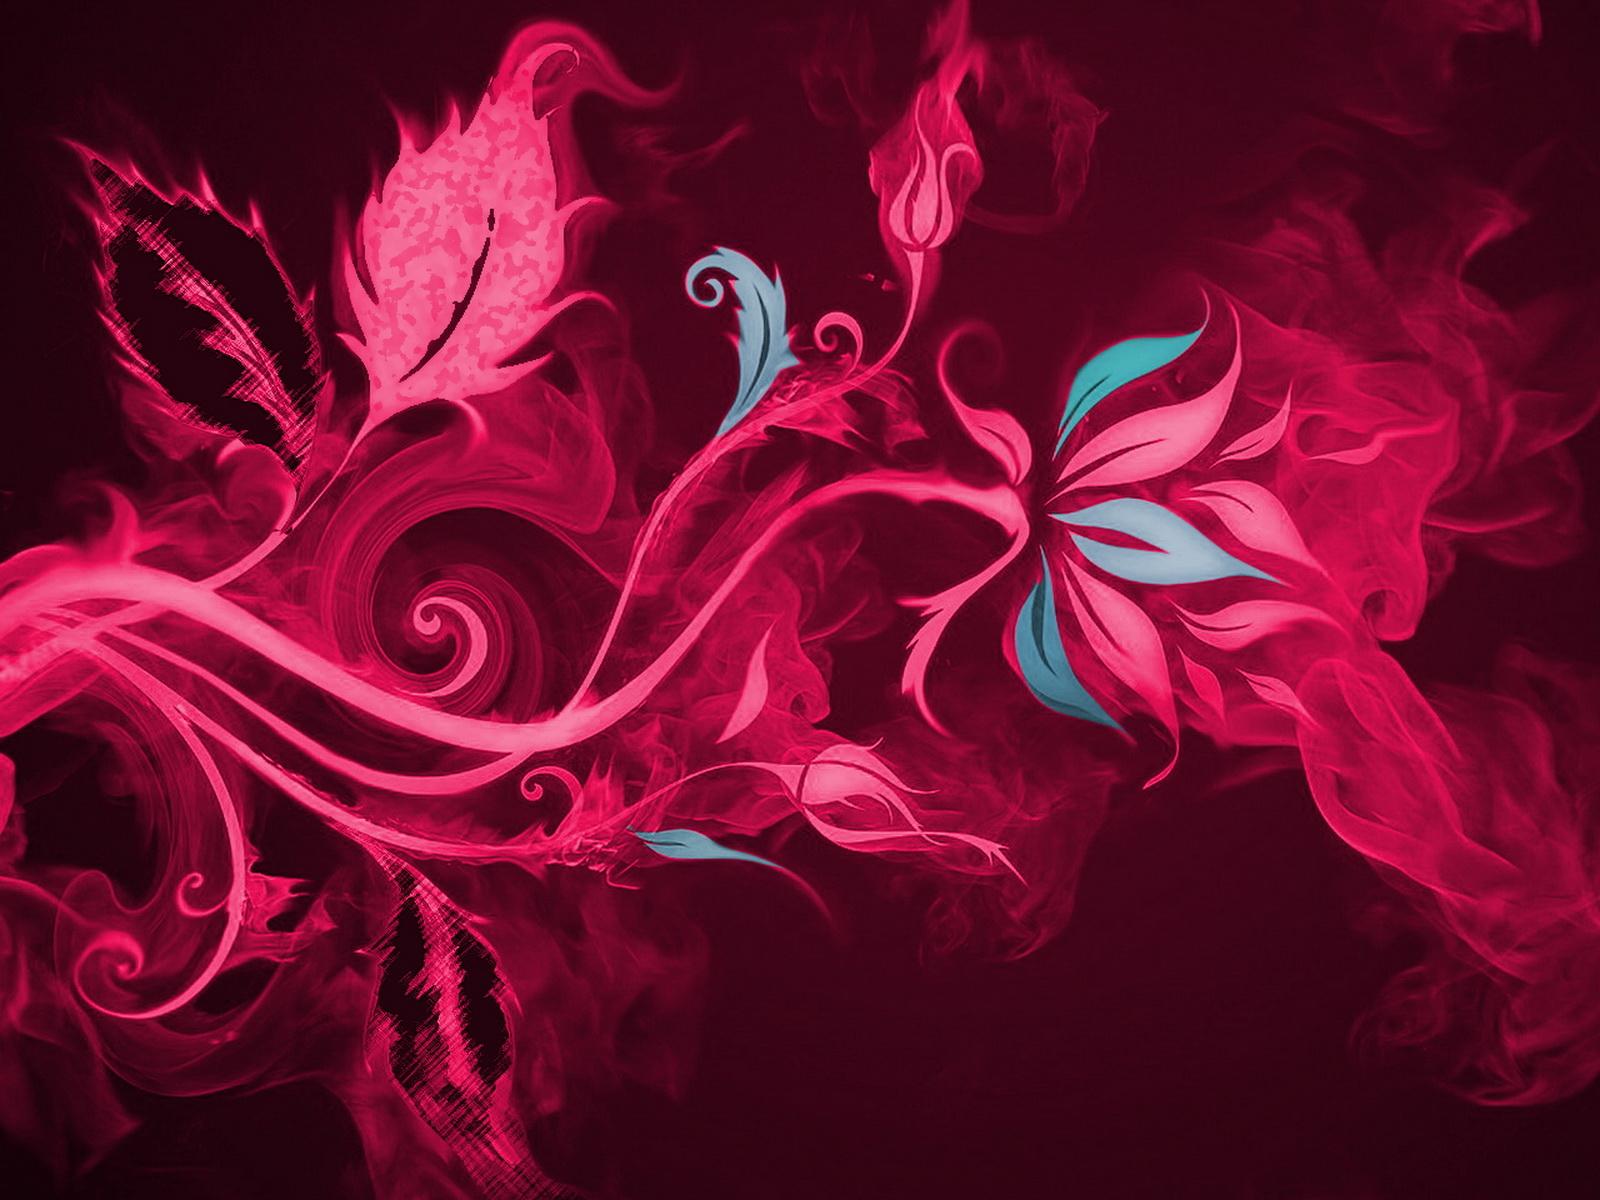 картинки огненный цветок: